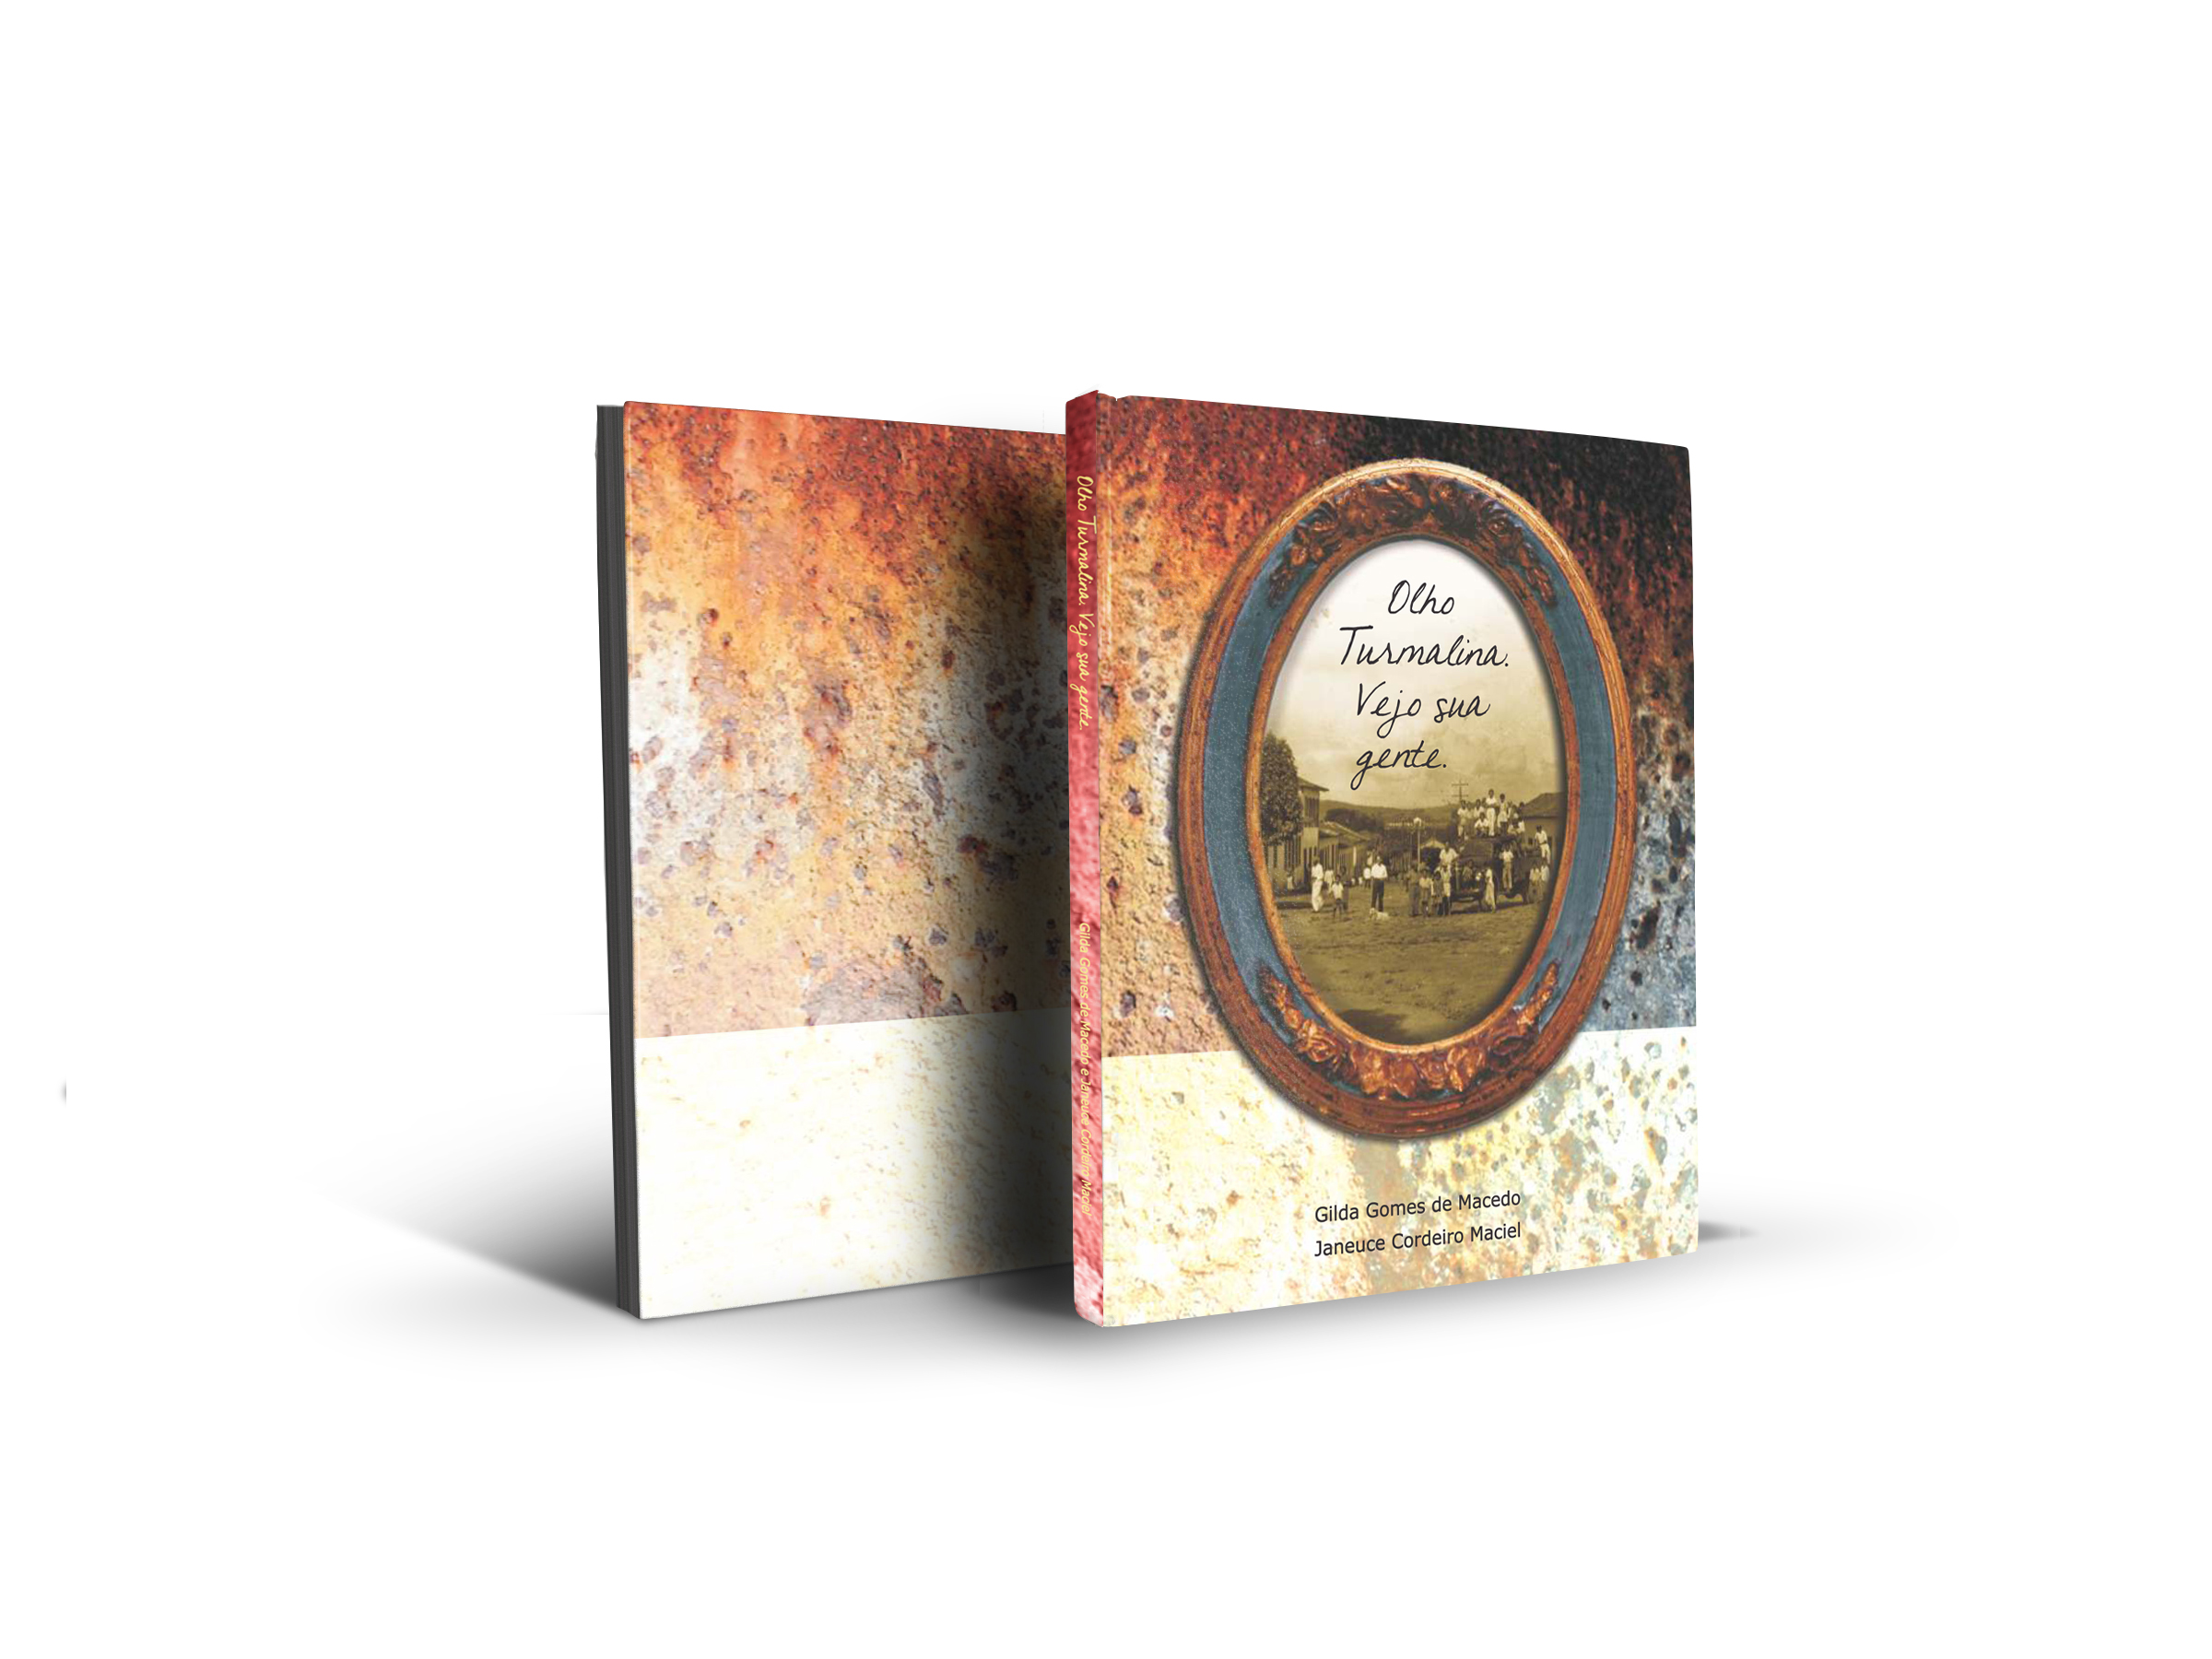 livro_biografia_olho_turmalina